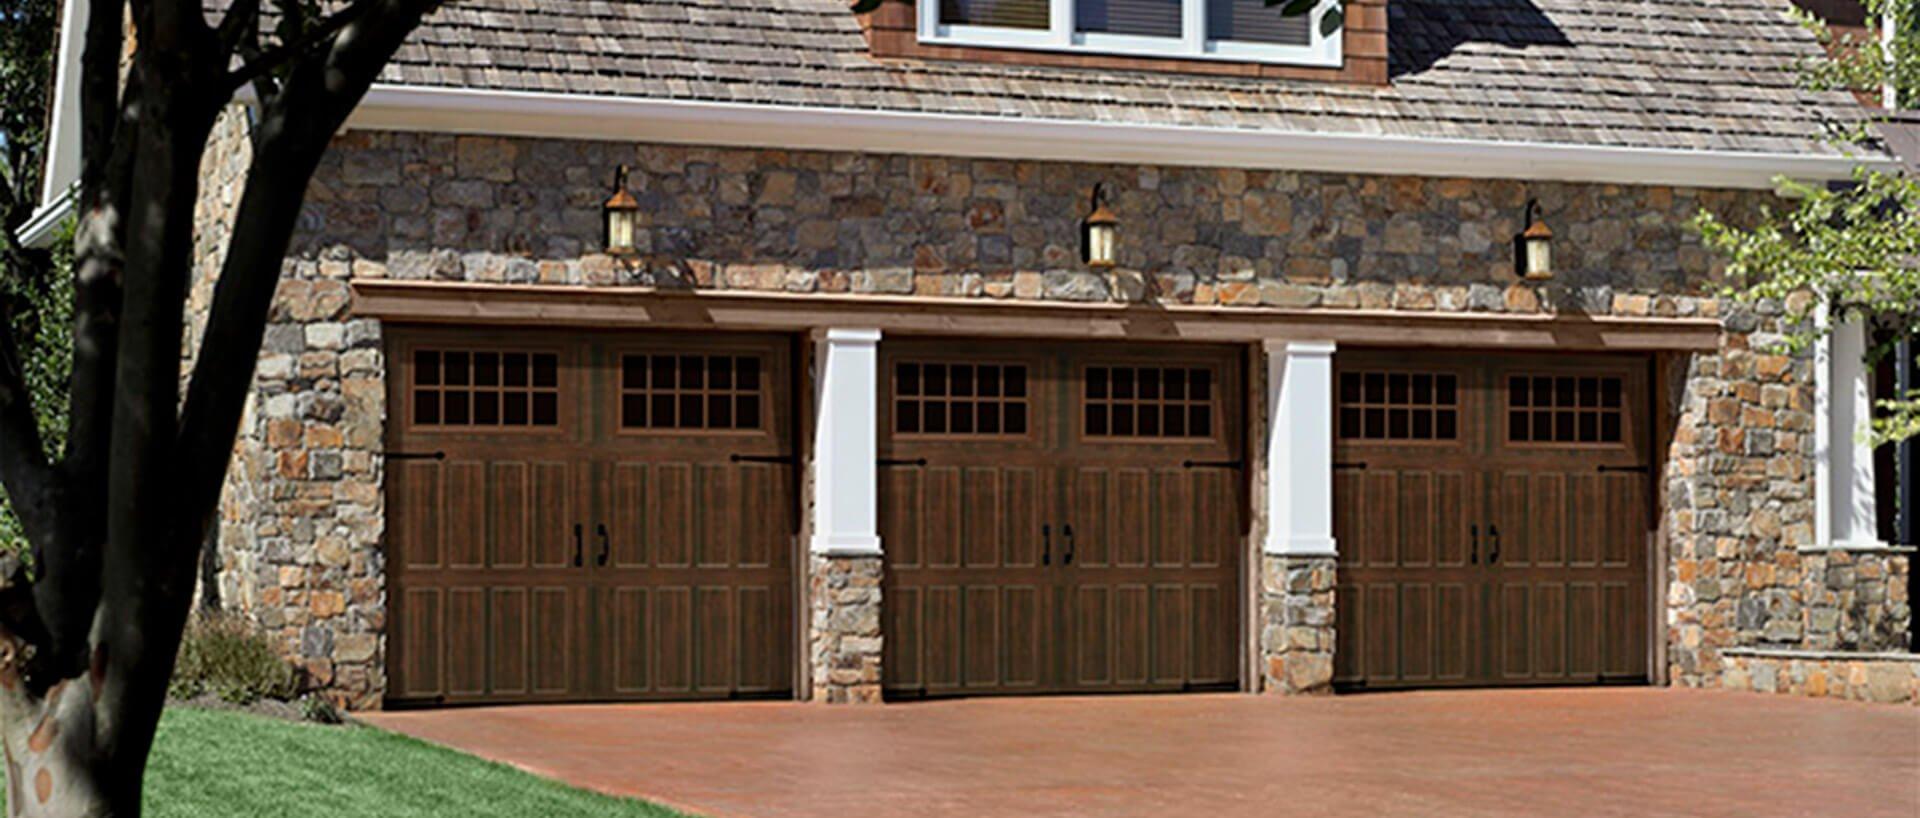 WELCOME TO ANDERSON GARAGE DOORS & Anderson Garage Doors | Logan Utah Garage Doors